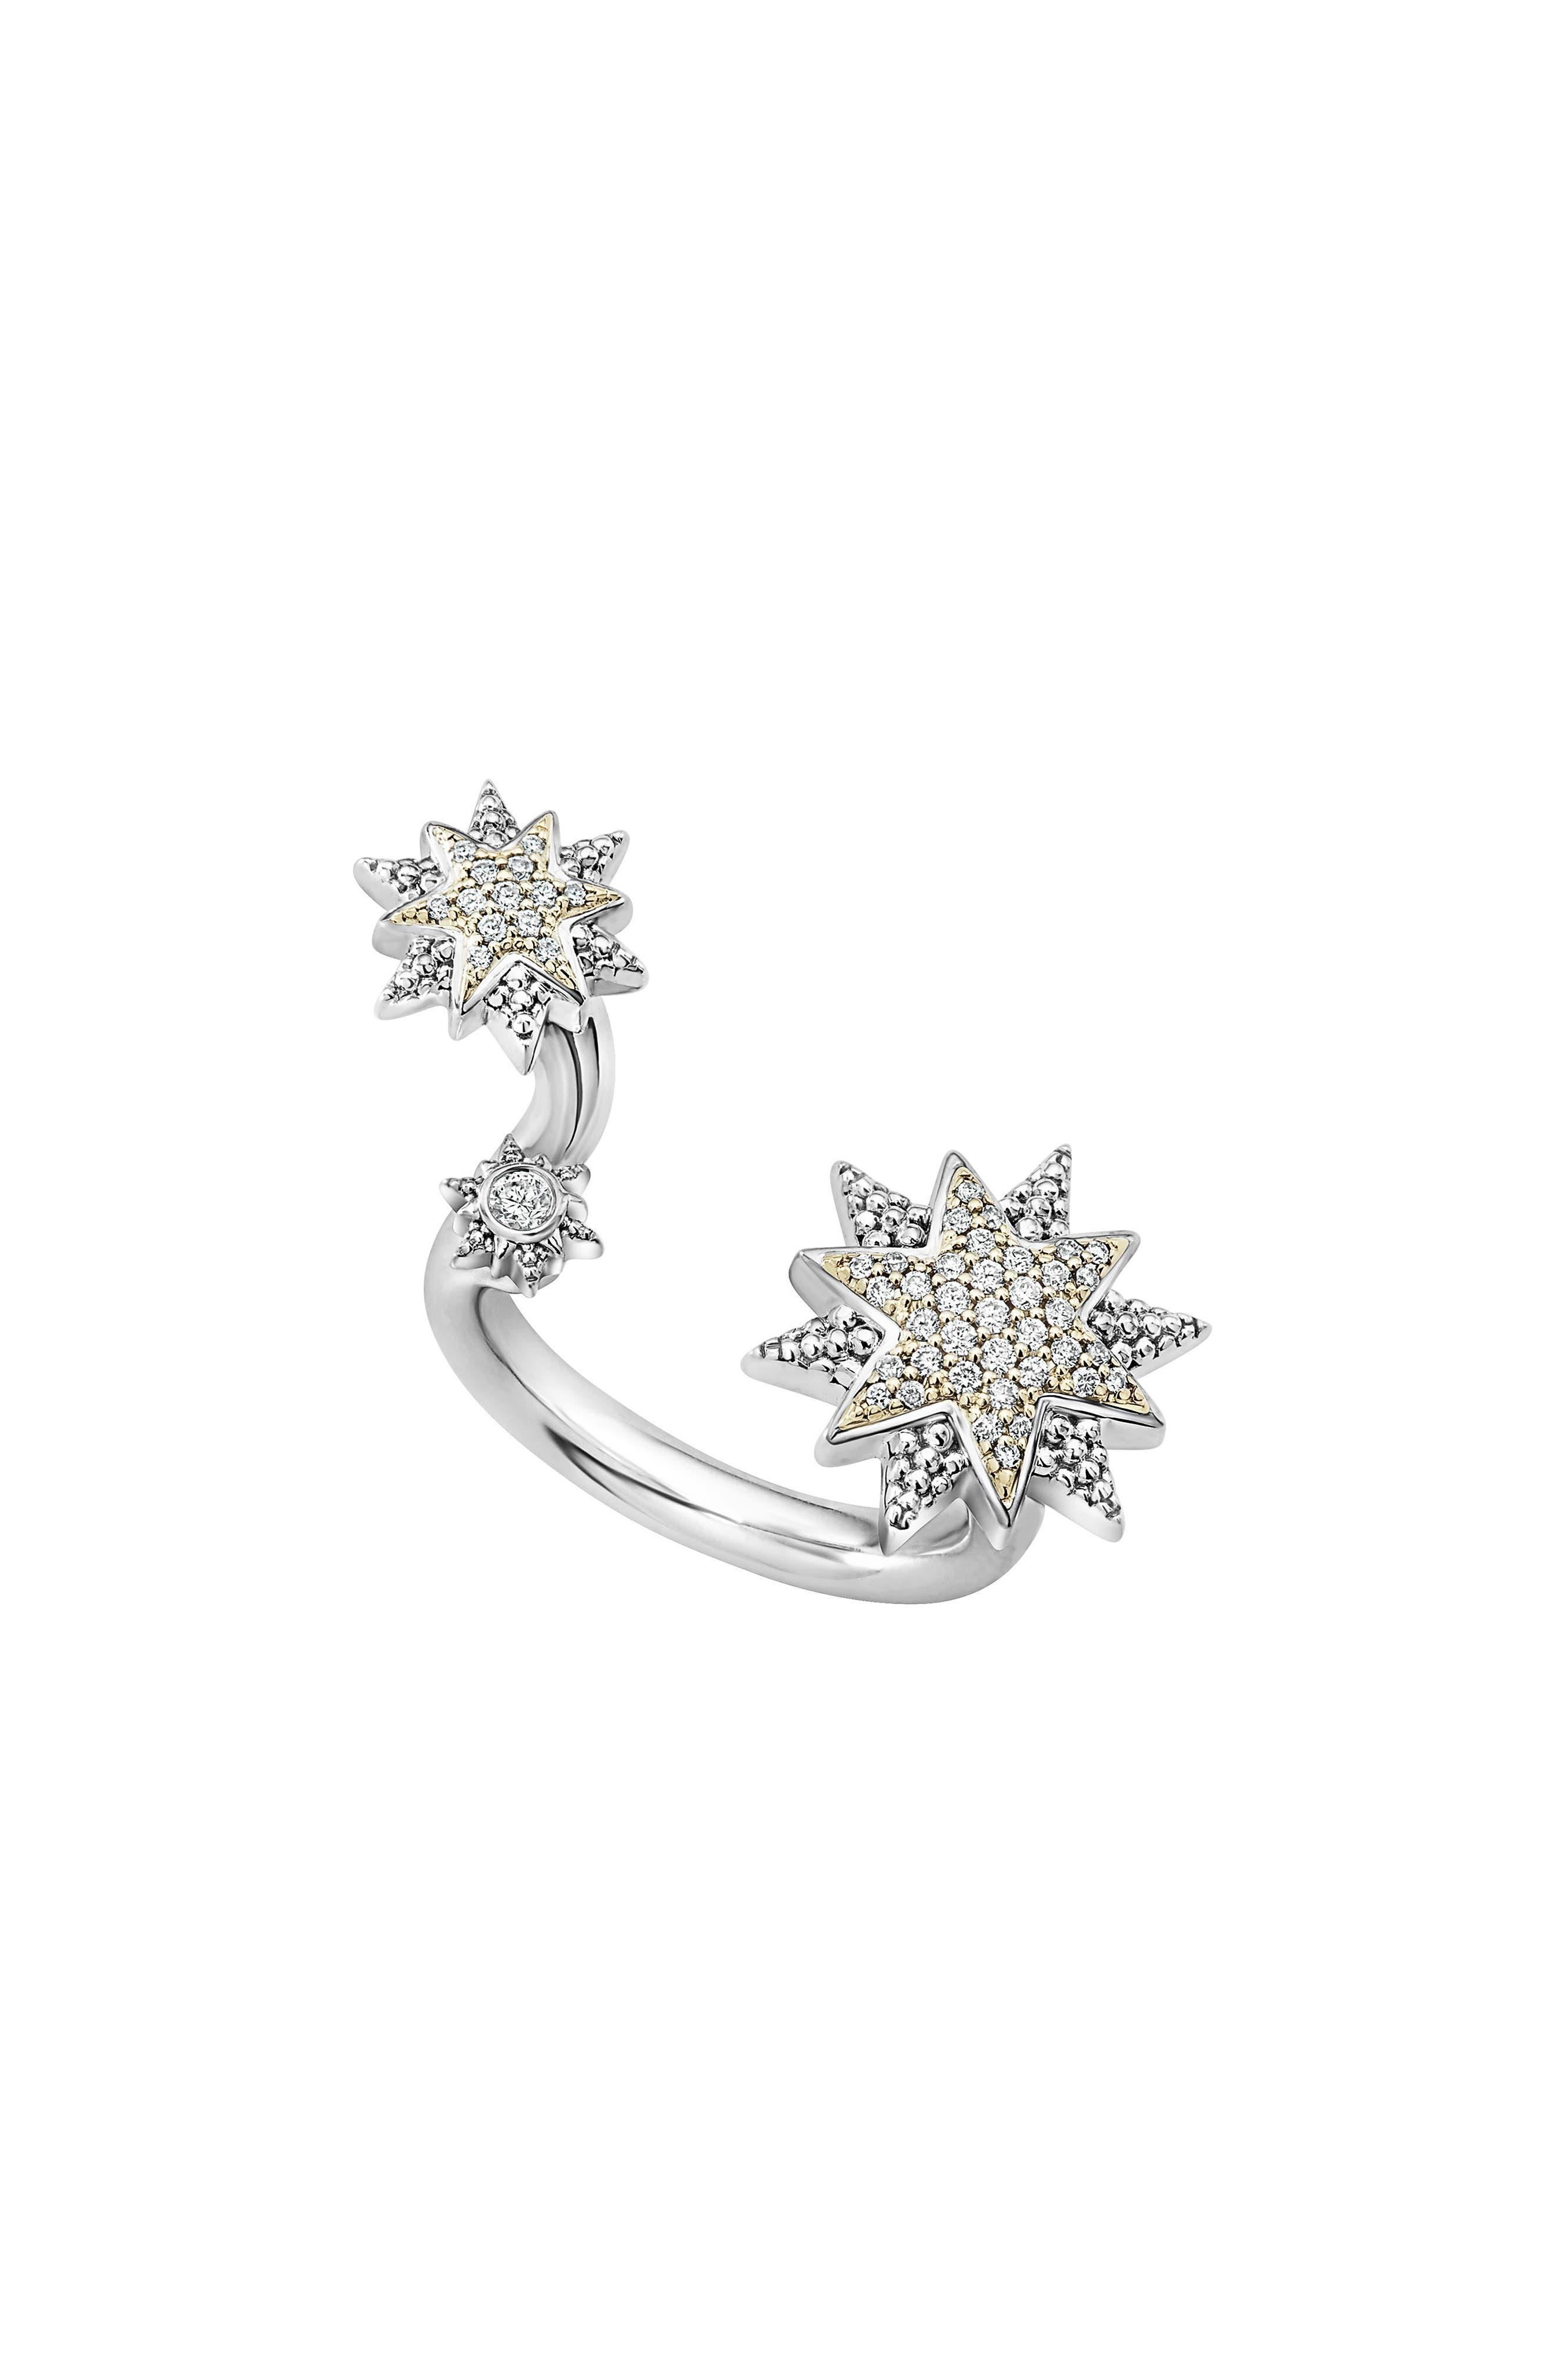 North Star Diamond Ring,                             Main thumbnail 1, color,                             Diamond